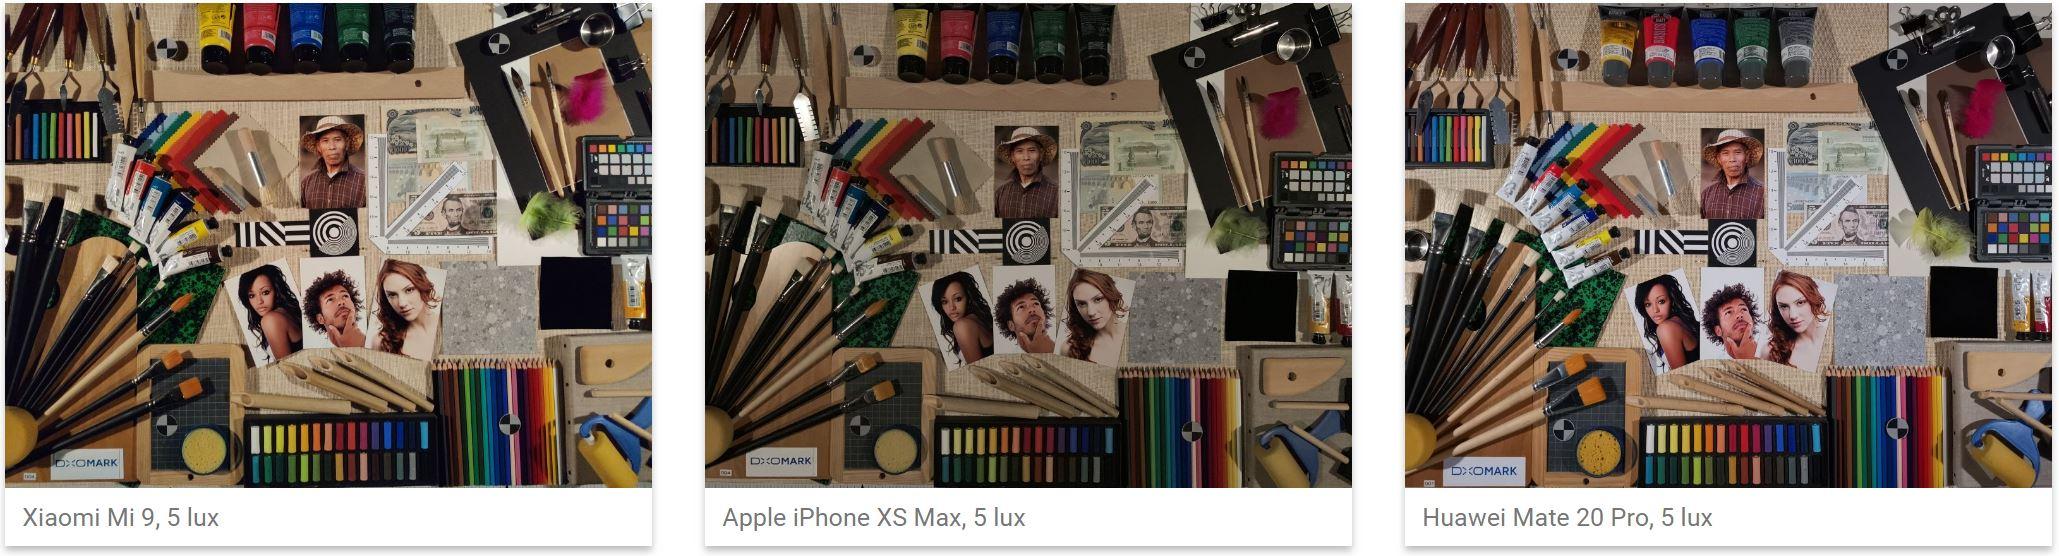 Xiaomi Mi 9 camera iphone xs max poze